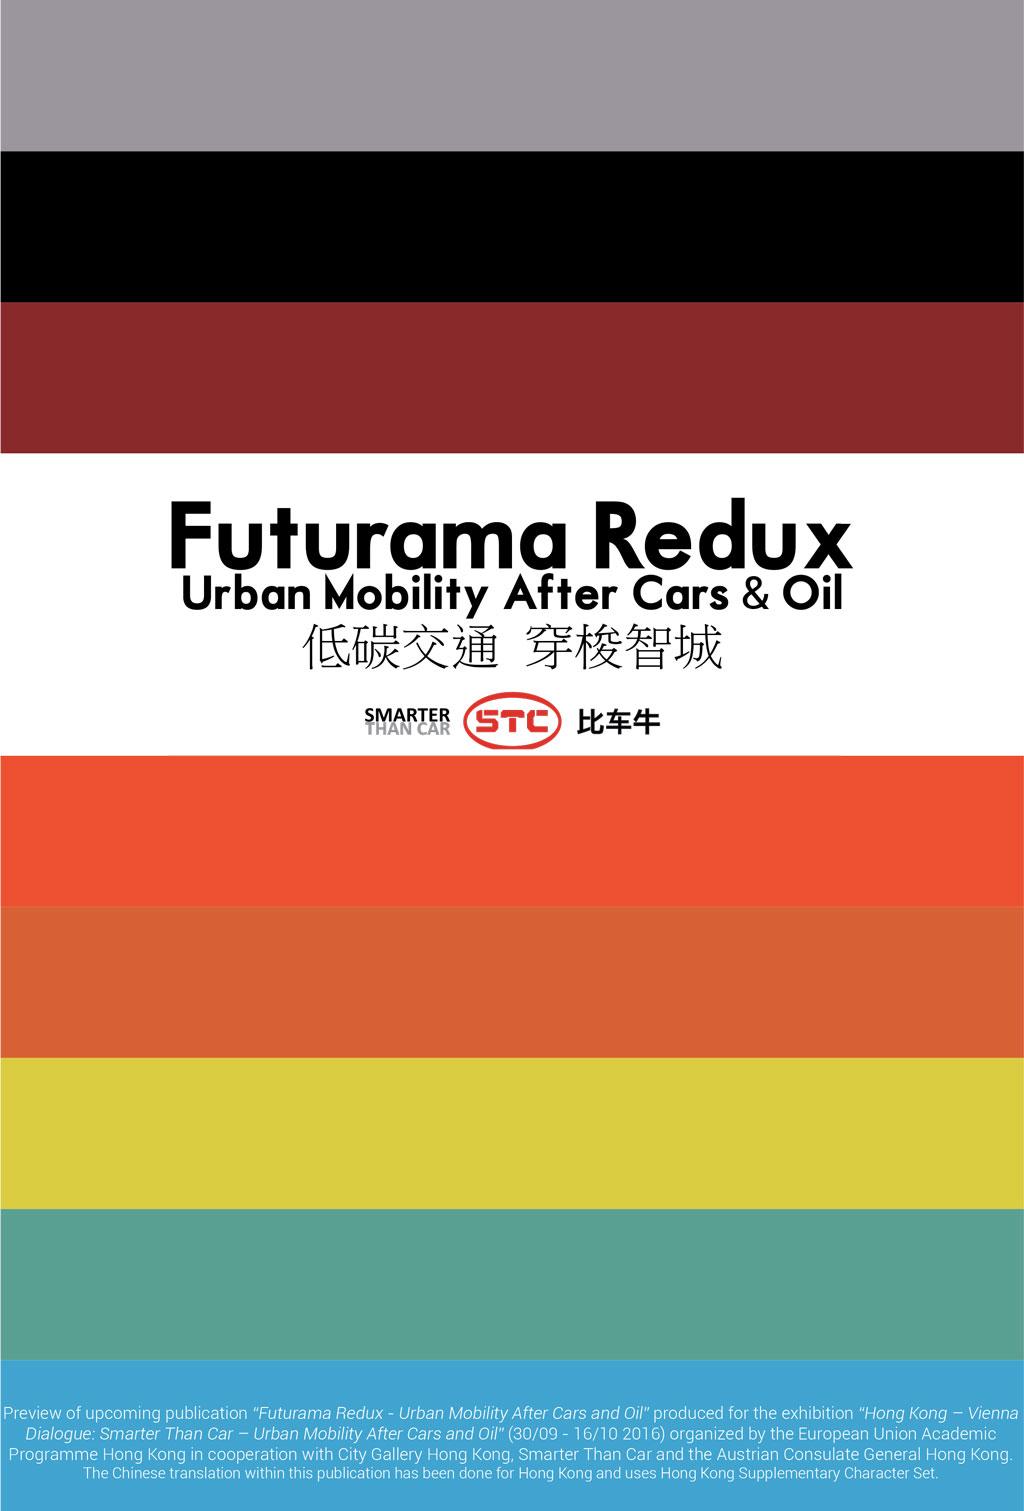 2016_Smarter-Than-Car_FUTURAMA-REDUX_Hong-Kong-Brochure-SHORT_20161004_web-1_TN